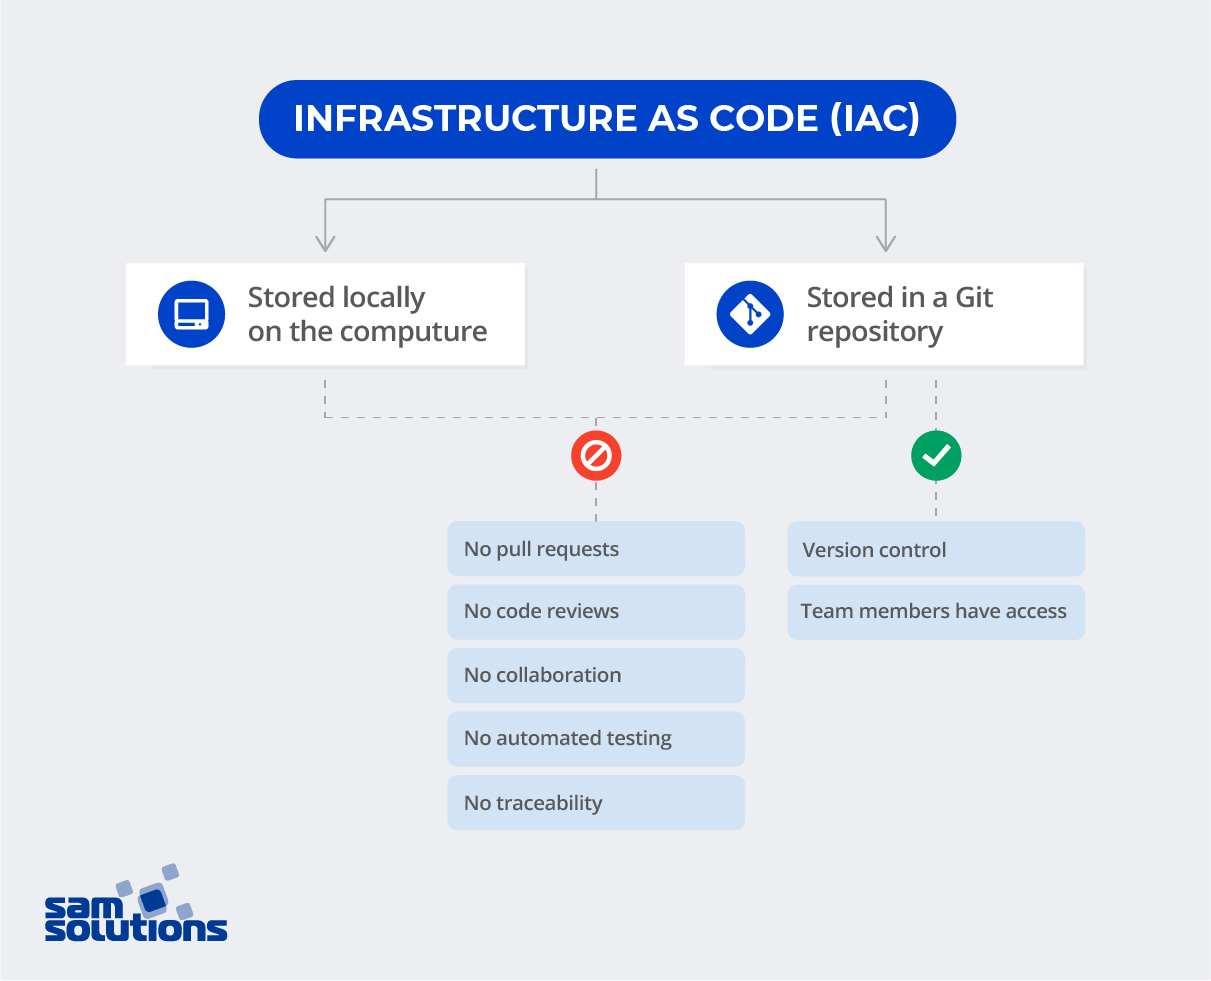 IaC Infrastructure as Code